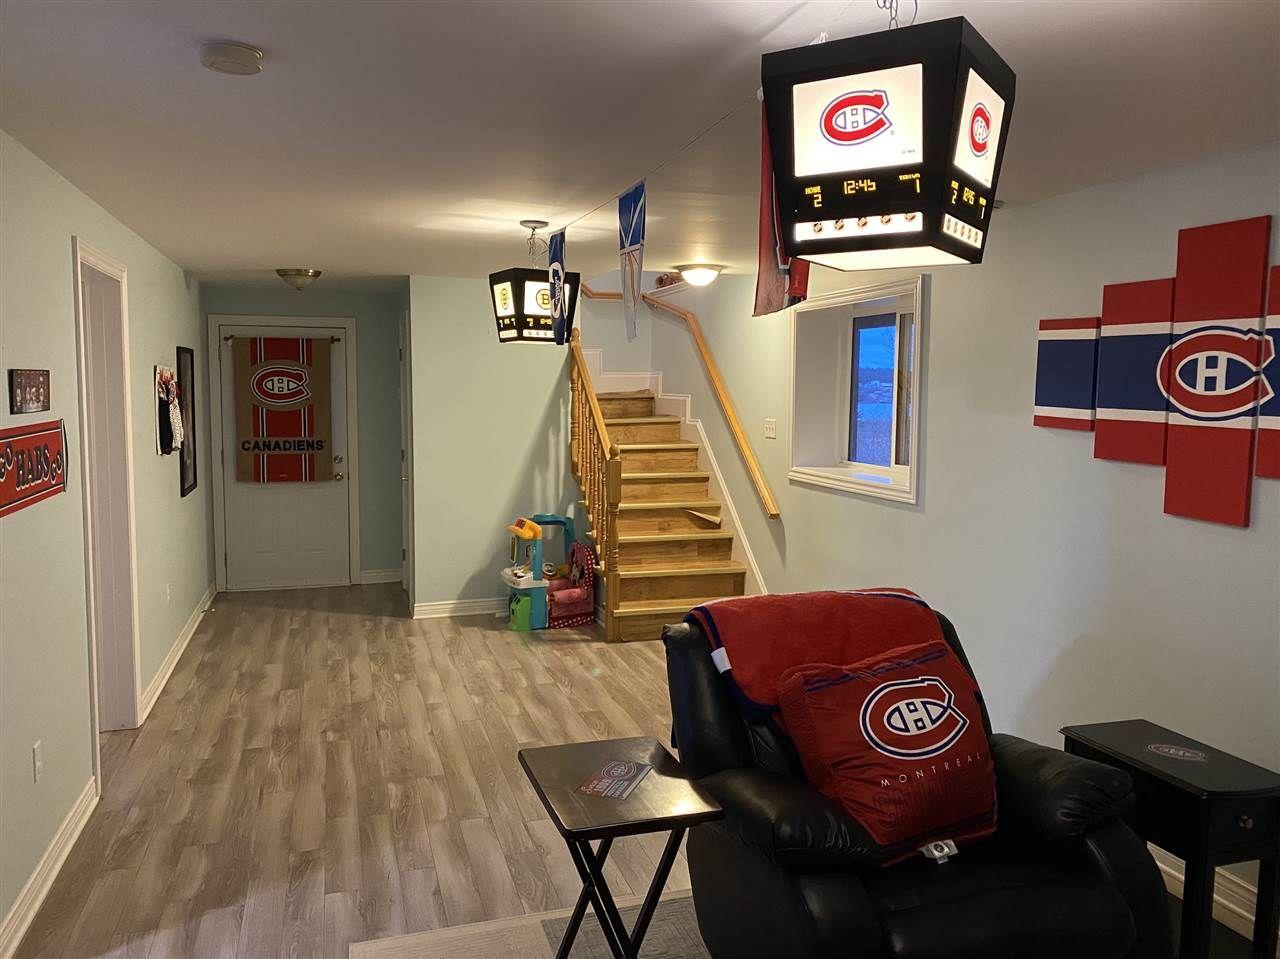 Photo 12: Photos: 7327 Main Street in Louisbourg: 206-Louisbourg Residential for sale (Cape Breton)  : MLS®# 202025505